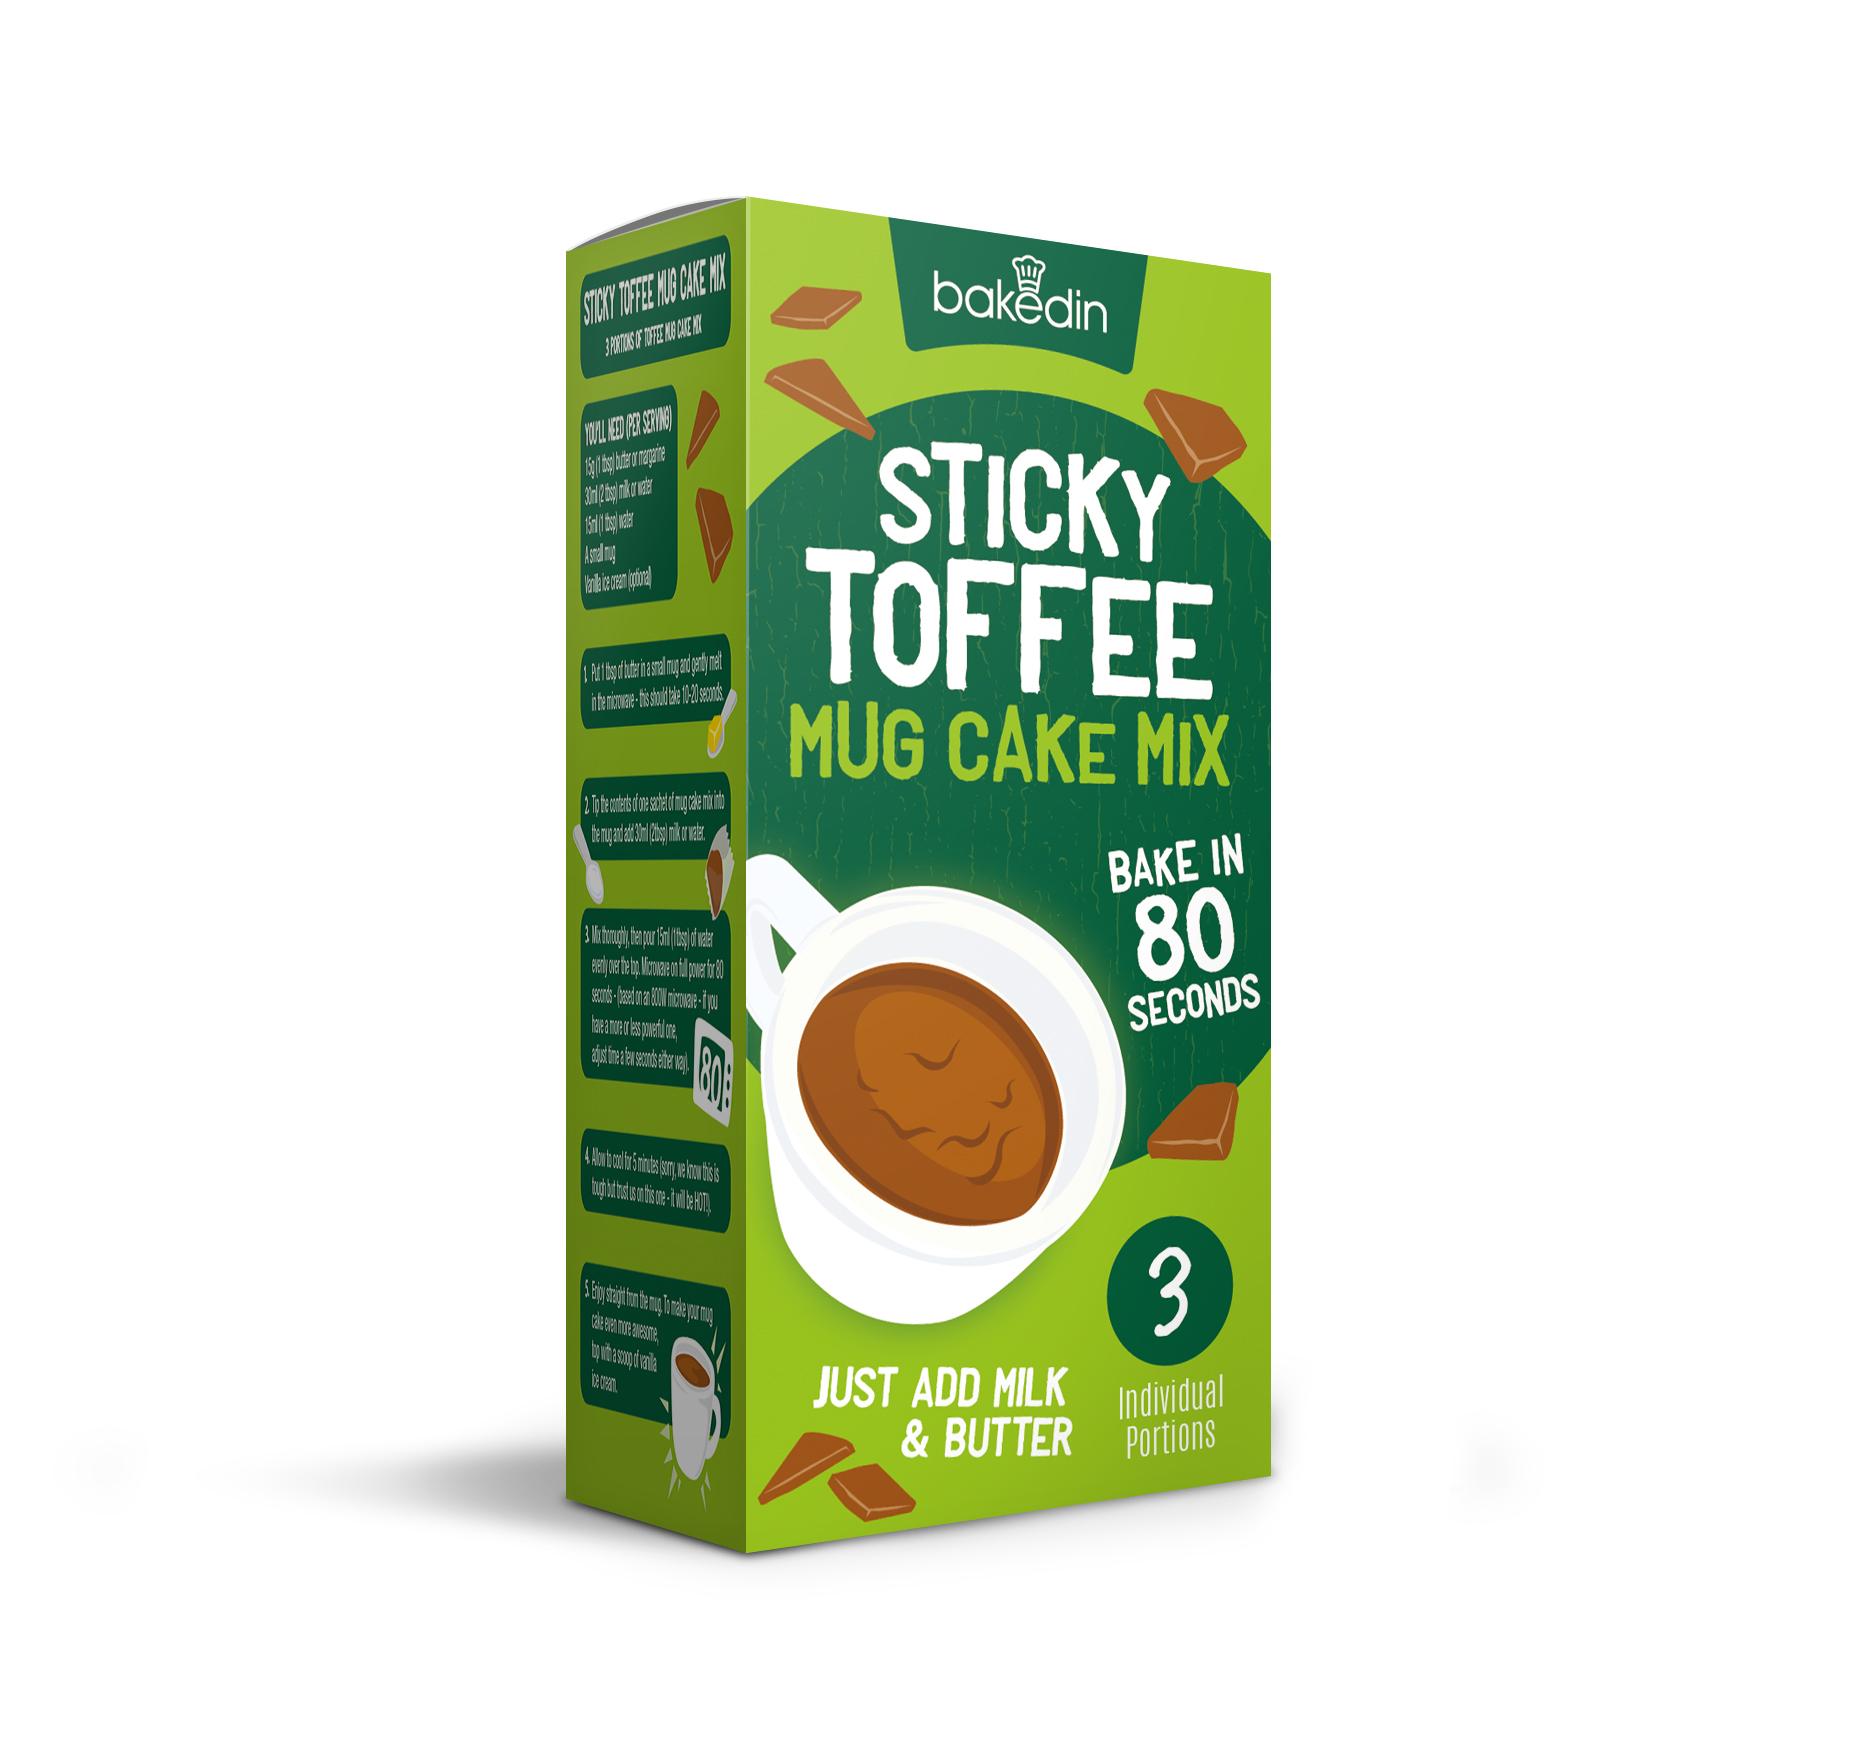 Baked In Sticky Toffee Mug Cake Mix